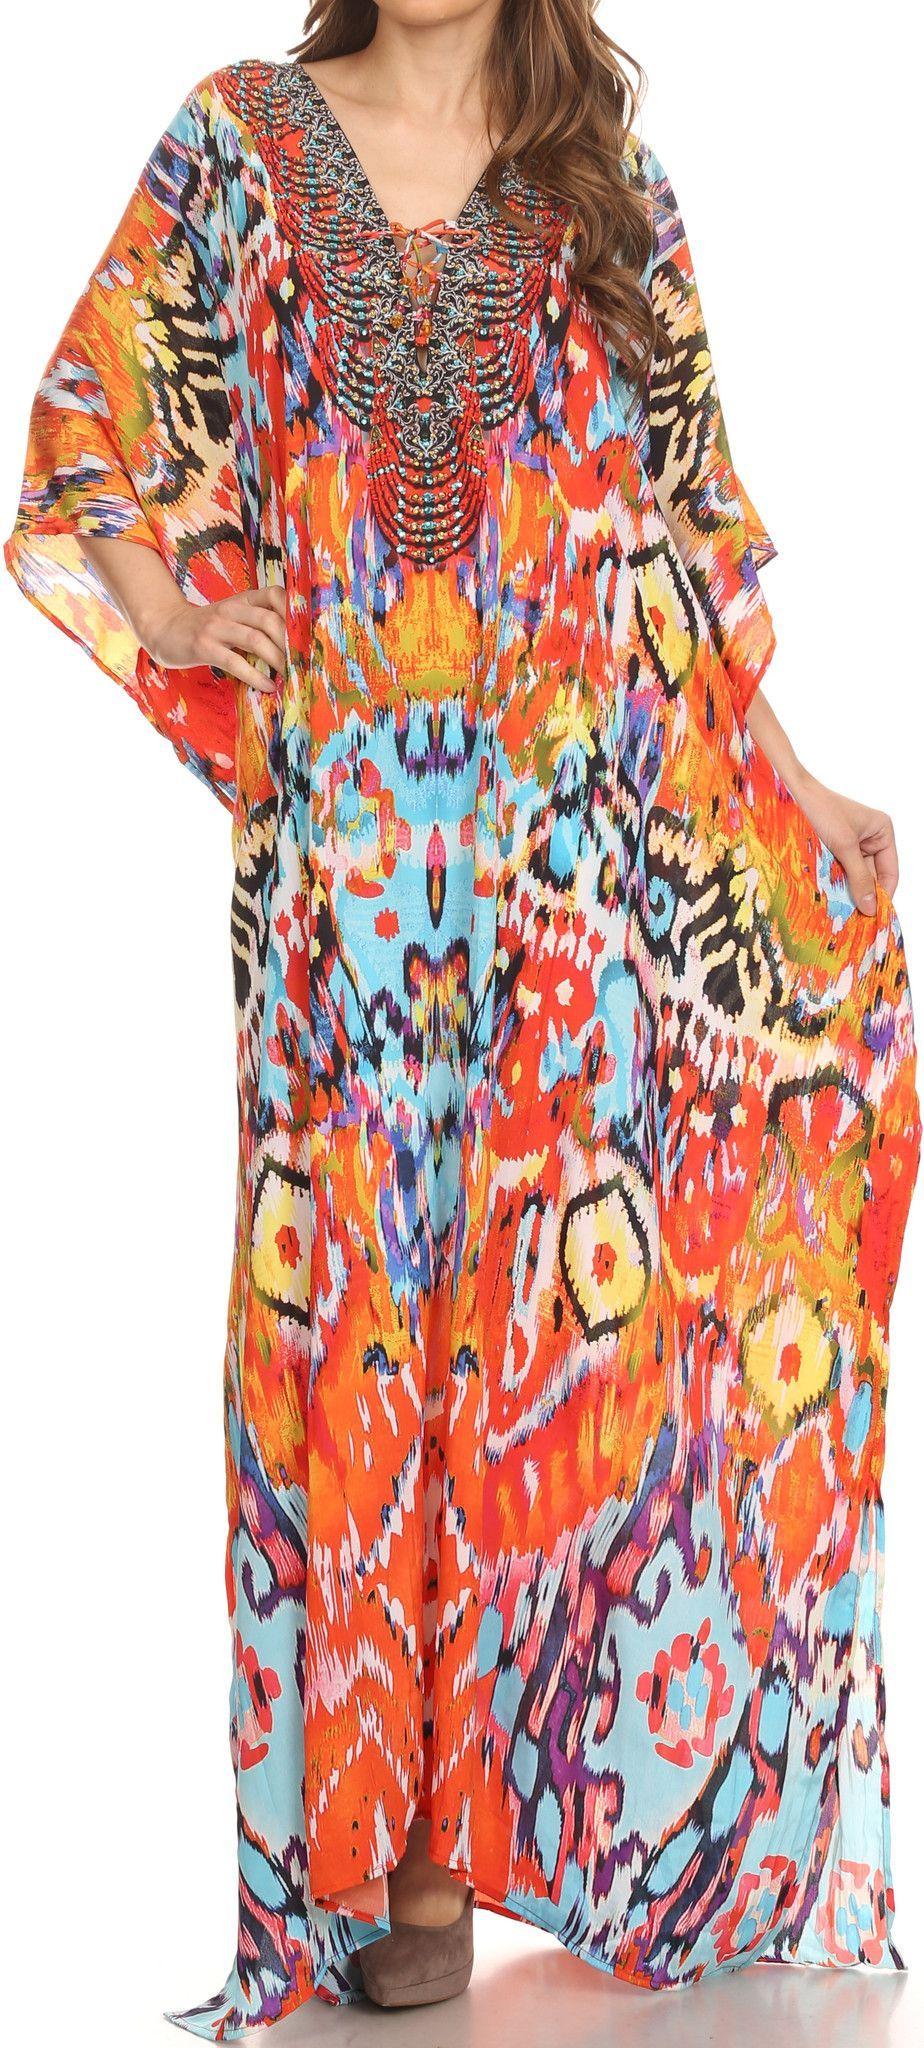 Sakkas Georgettina Flowy Rhinestone V Neck Long Caftan Dress Cover Up Caftan Dress Long Caftan Dress Long Caftan [ 2048 x 924 Pixel ]